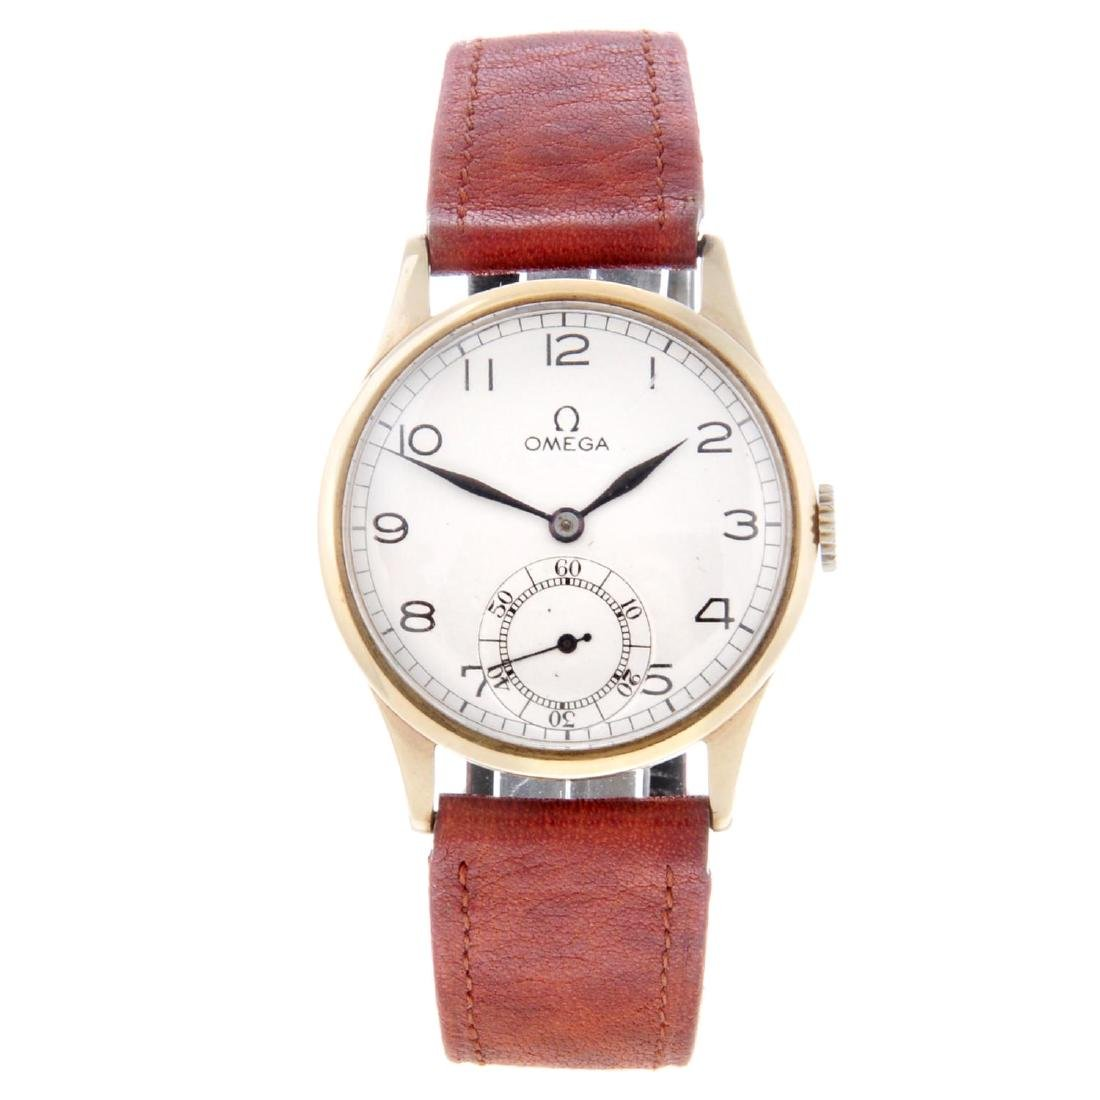 OMEGA - a gentleman's wrist watch. 9ct yellow gold